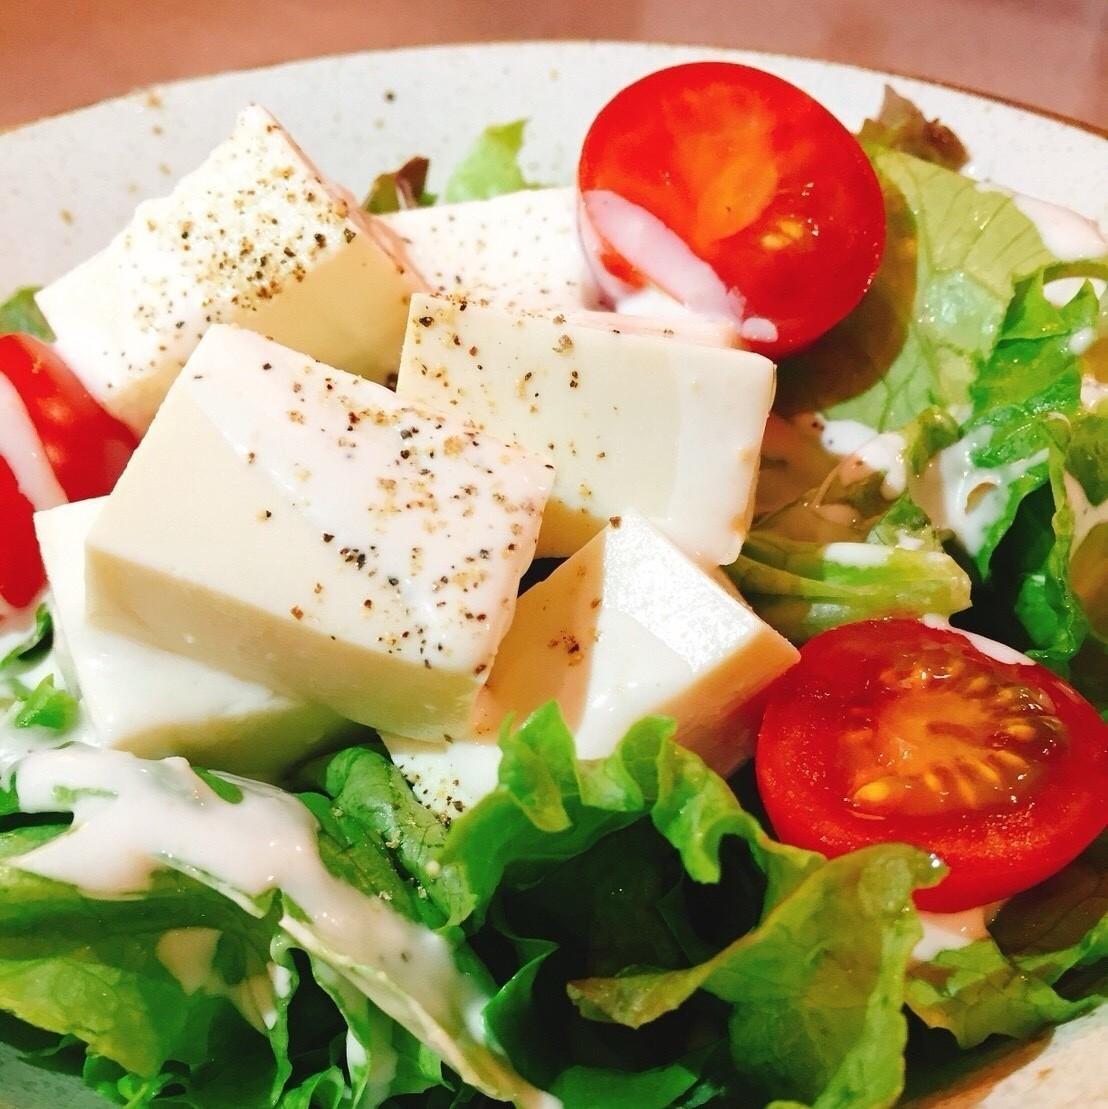 Caesar salad with Tofu at Nishida store